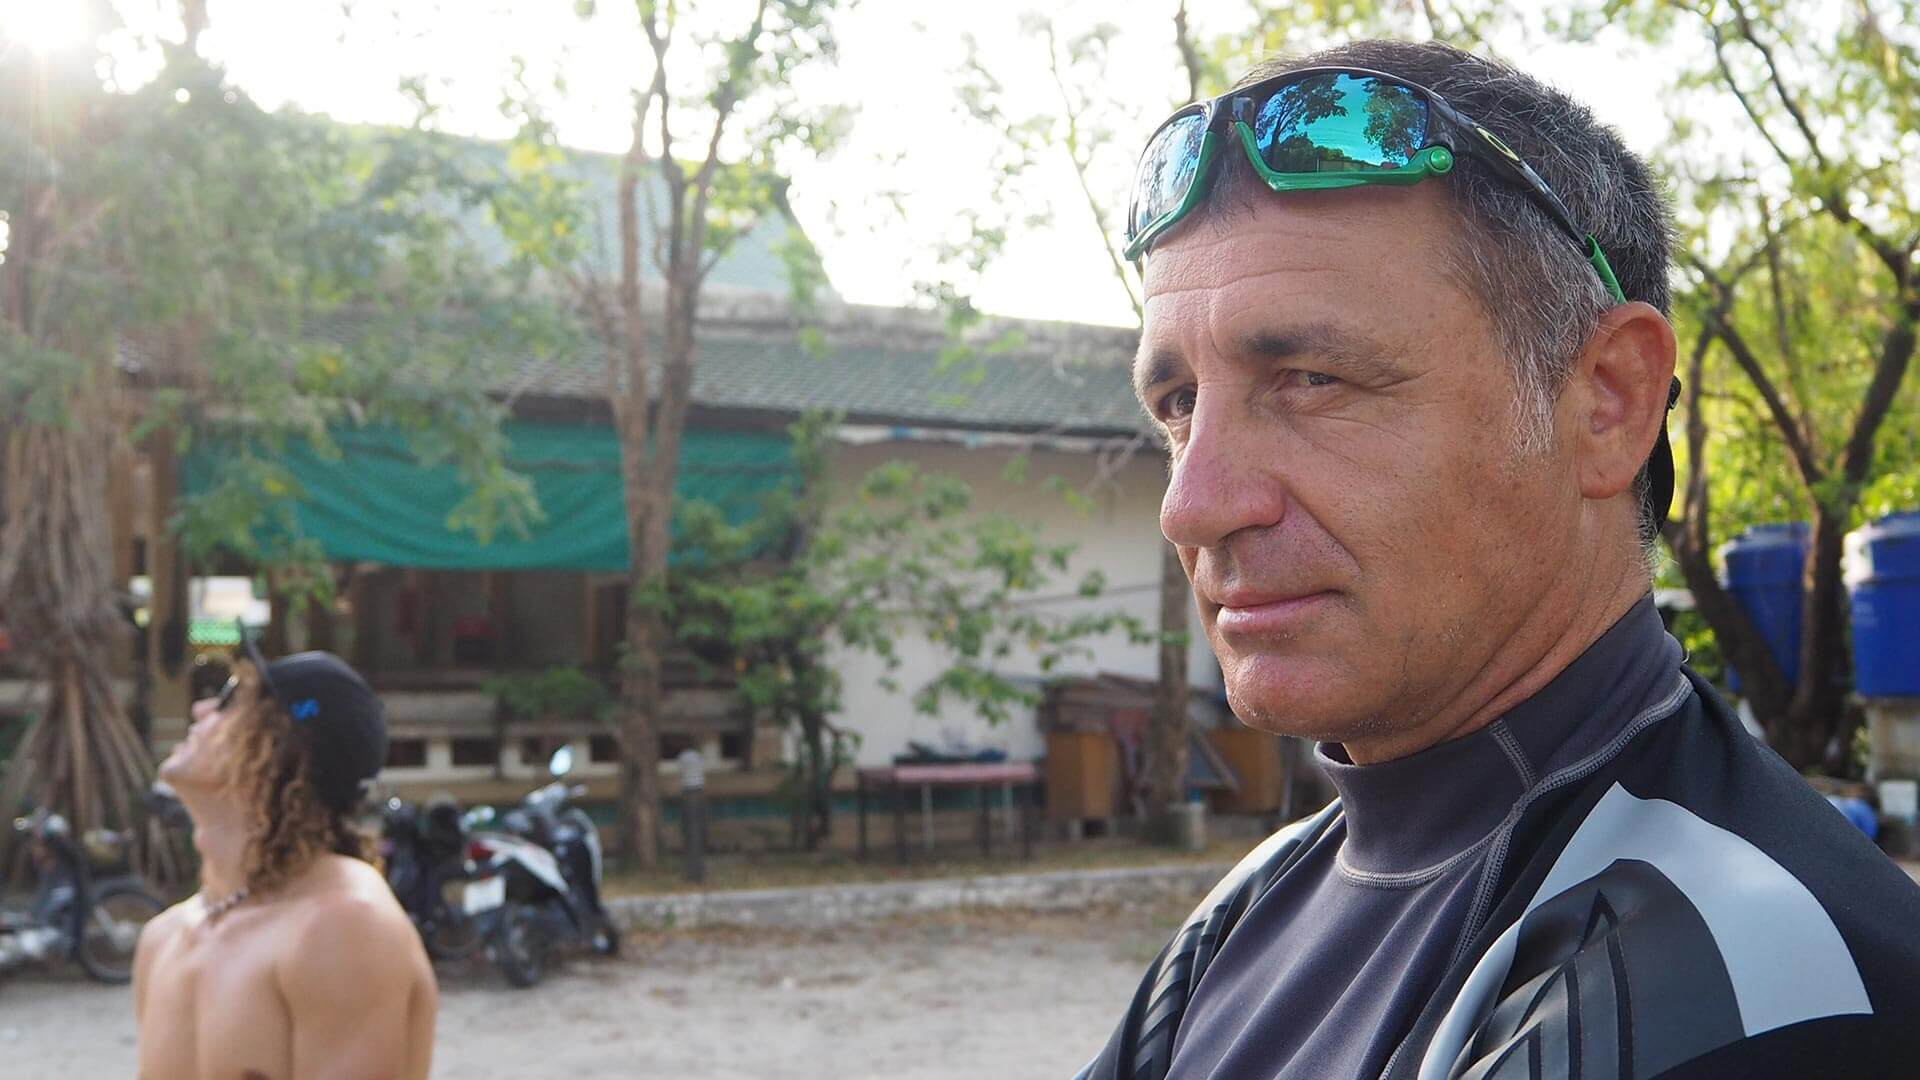 Darren Gaspari – PADI Course Director